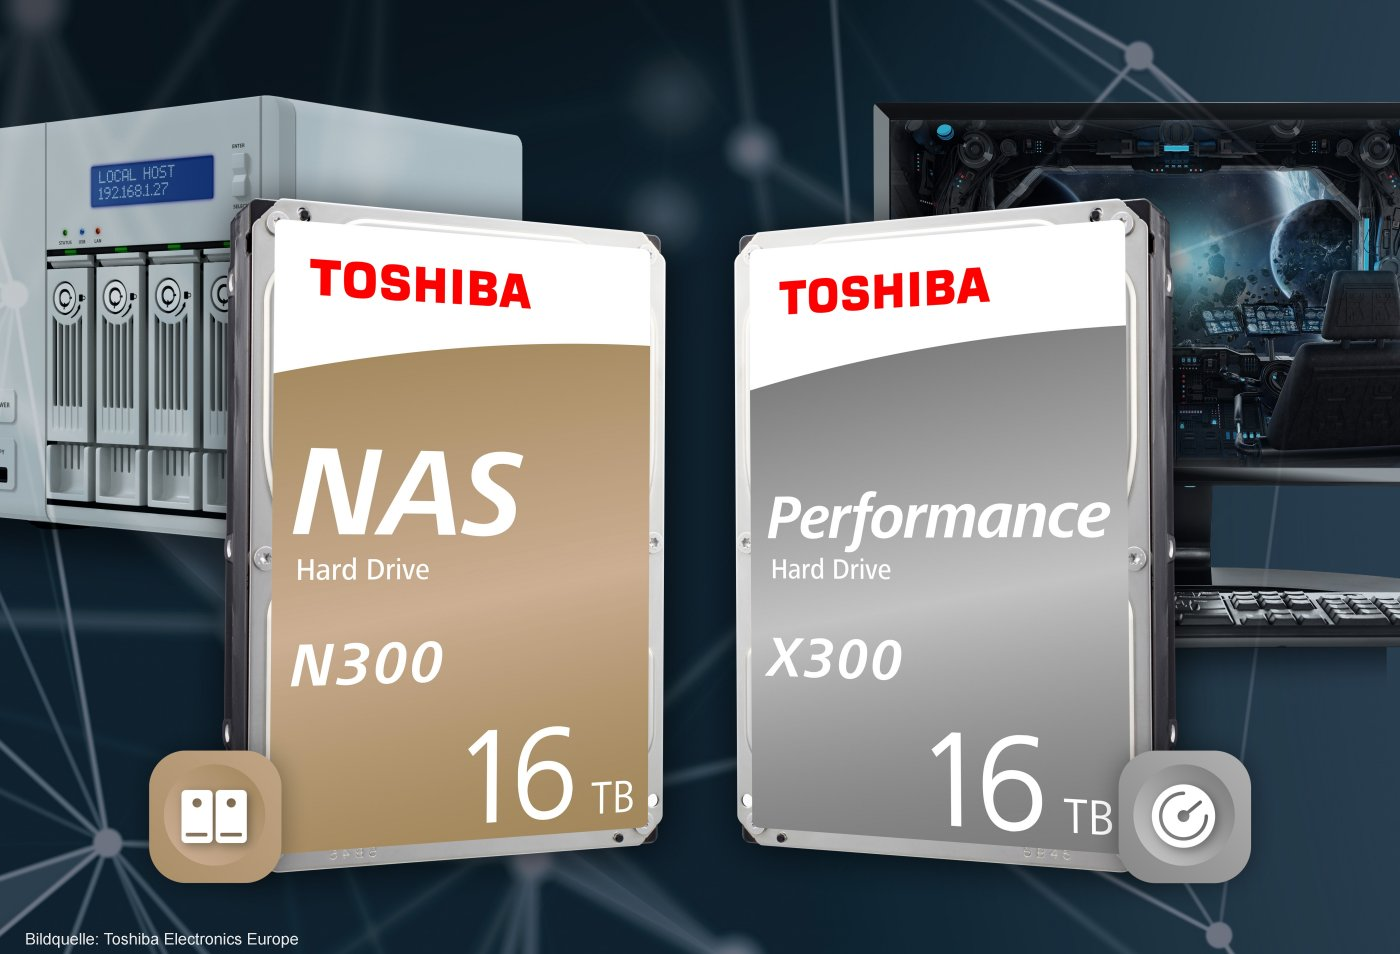 Toshiba N300-NAS- und X300-Performance-HDDs